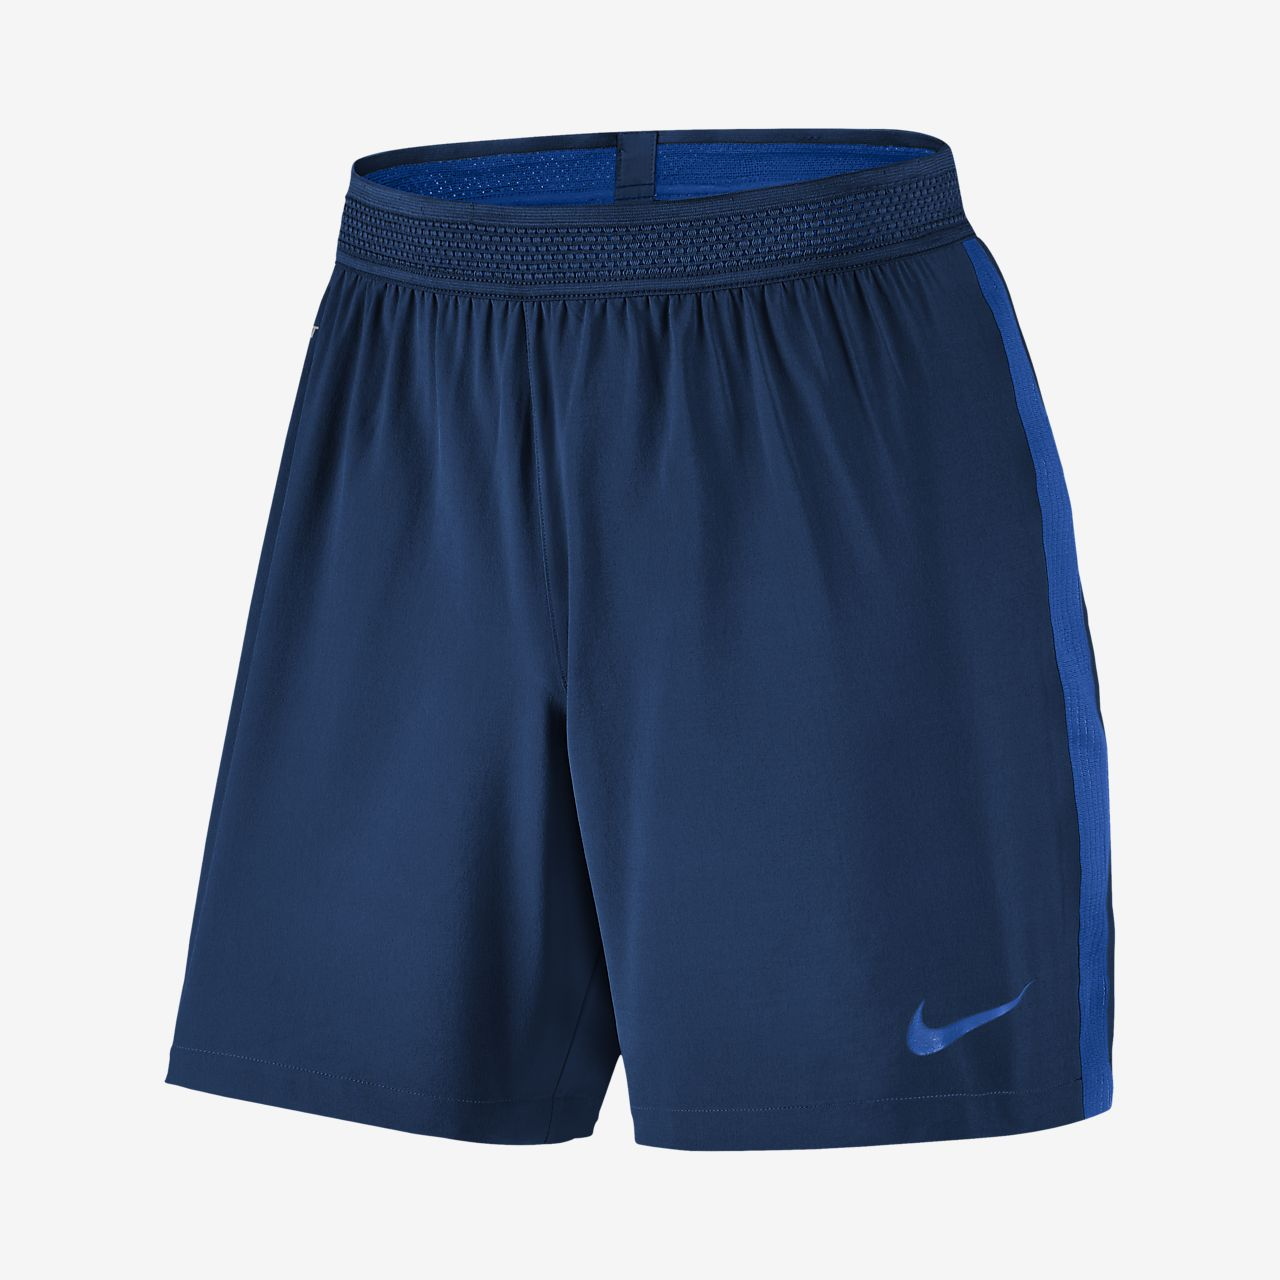 Nike Flex Strike Men's Football Shorts